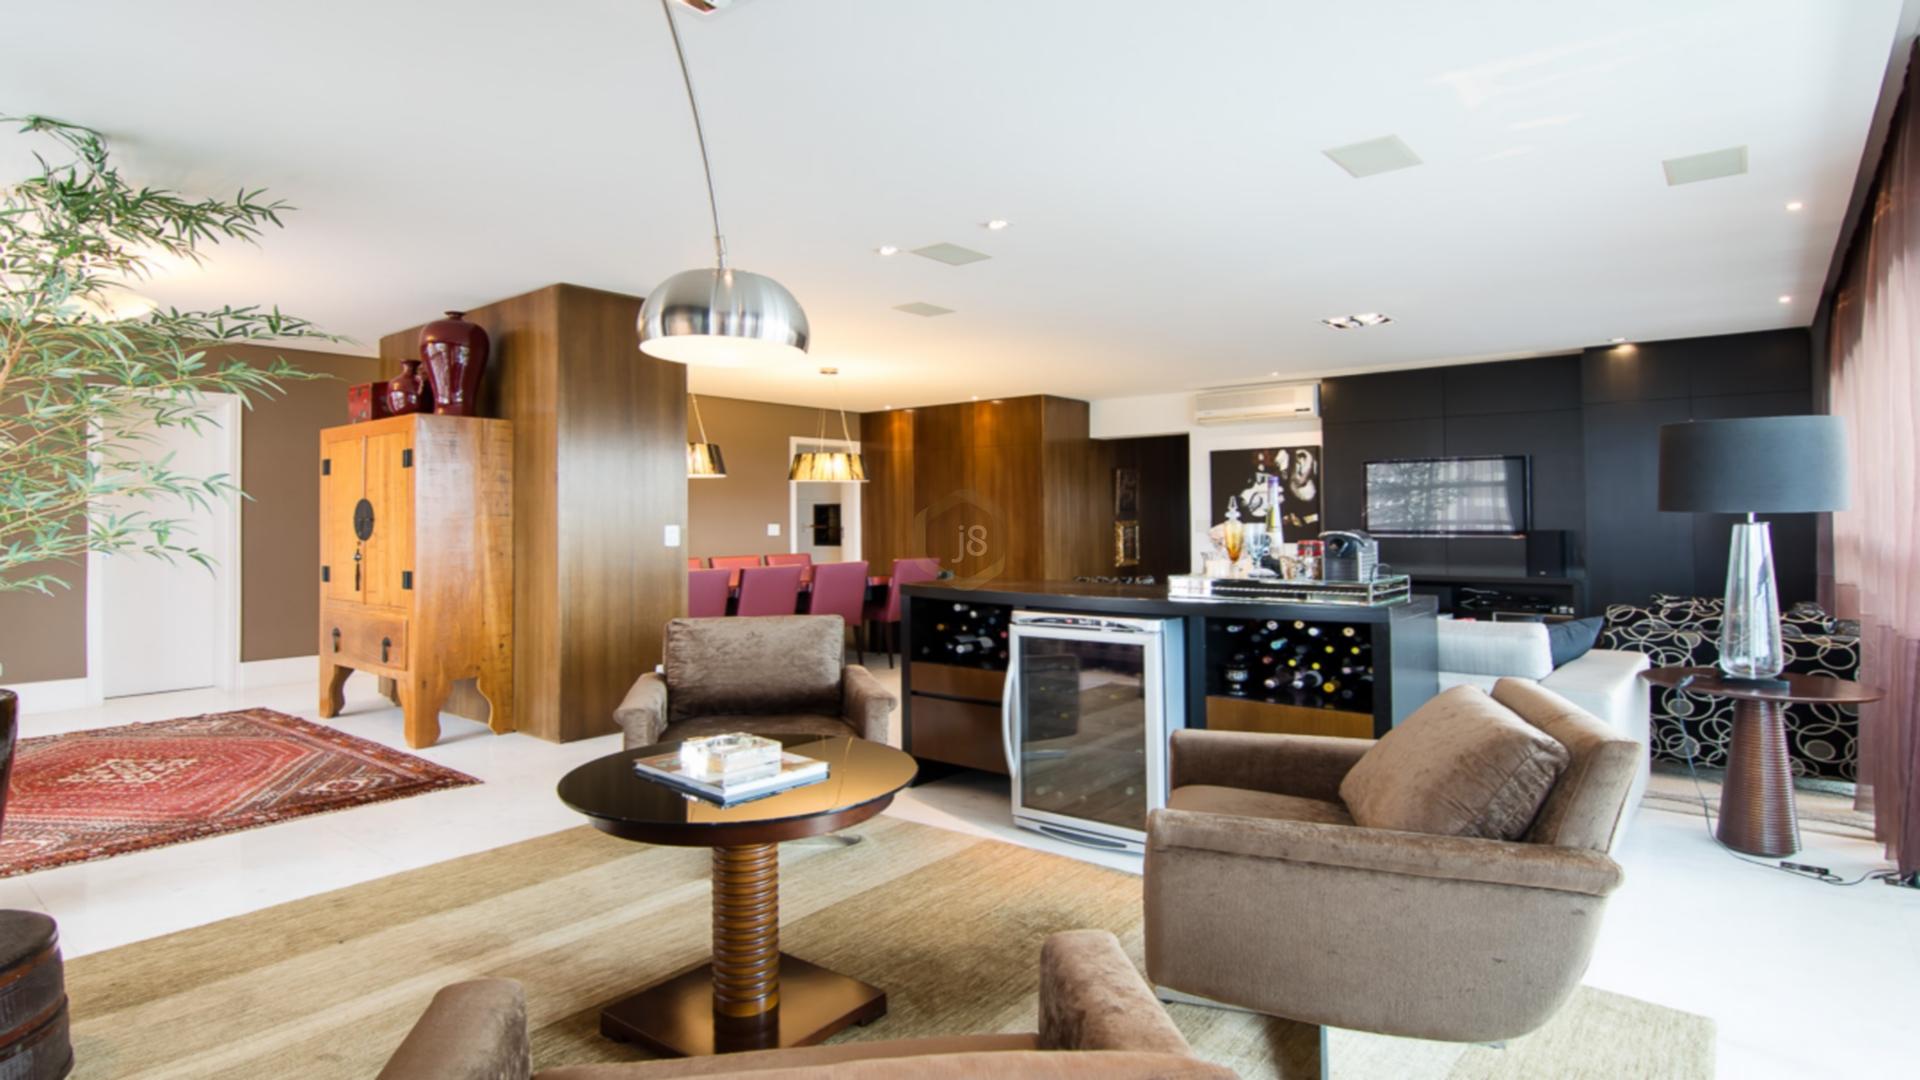 Foto de destaque Charmoso apartamento!